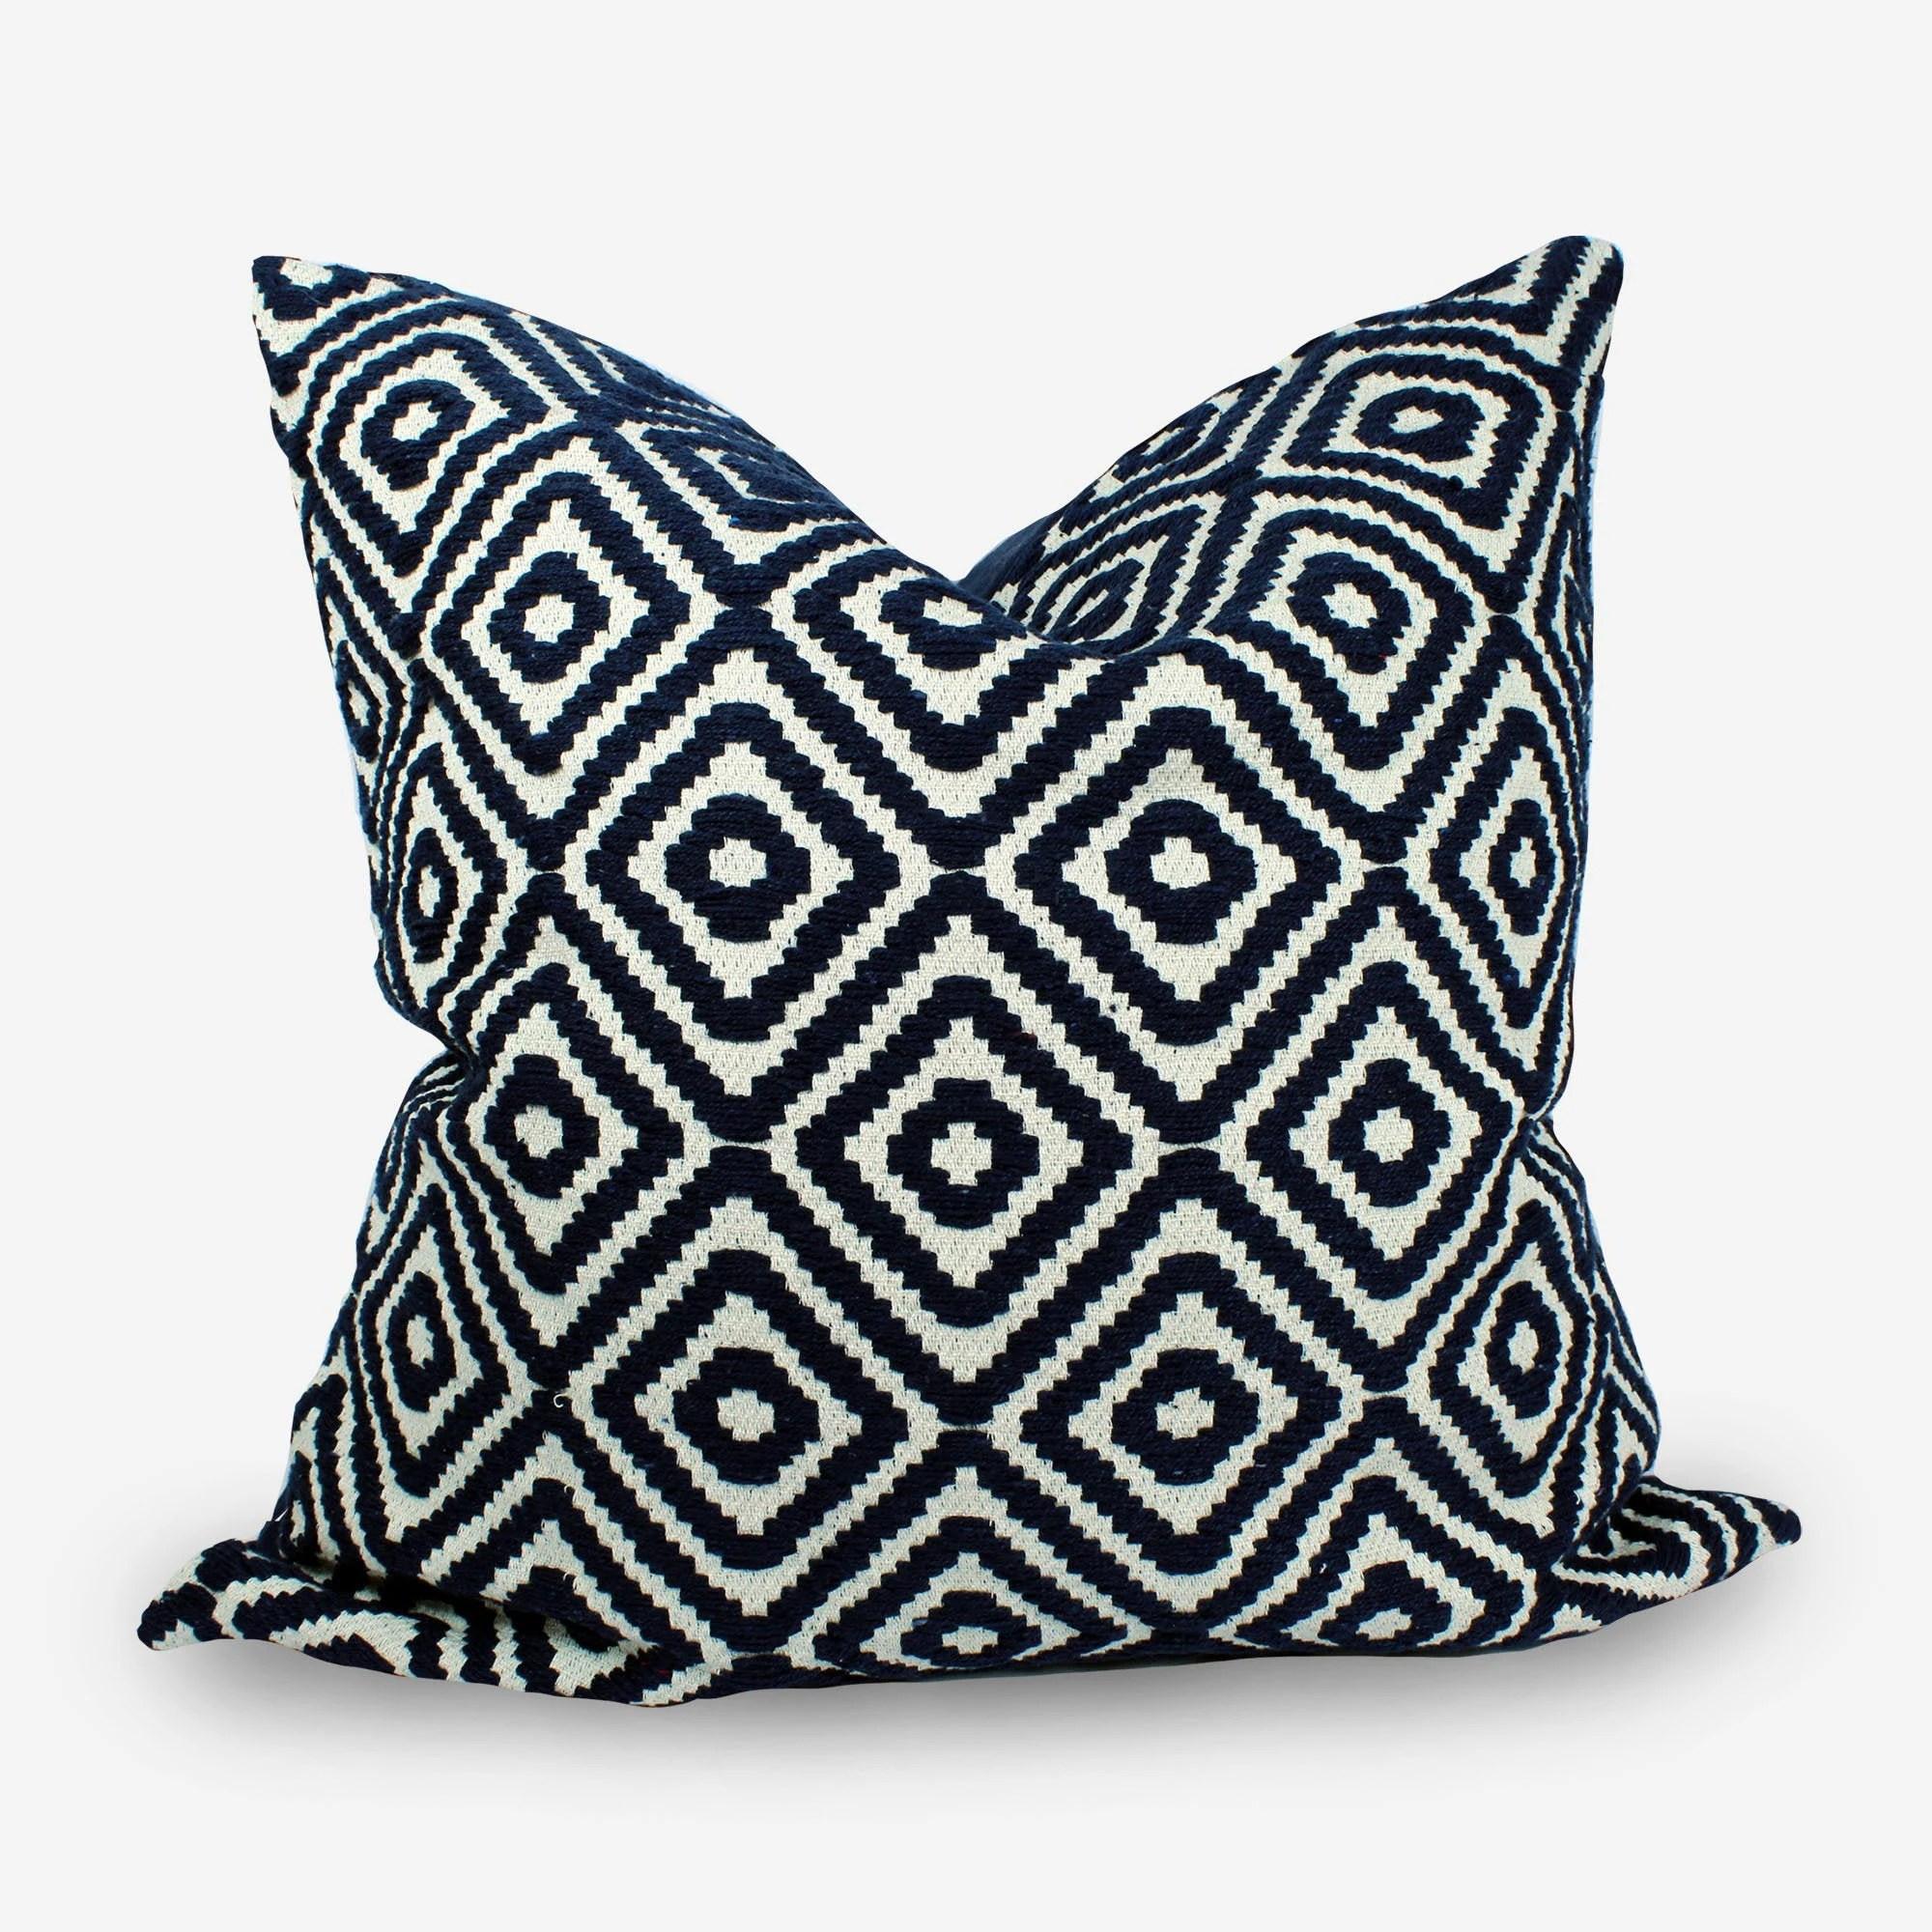 24x24 pillow cover boho navy blue cushion cover 28 x 28 beige euro sham 26x26 throw pillow covers 20x20 neutral pillow covers 22x22